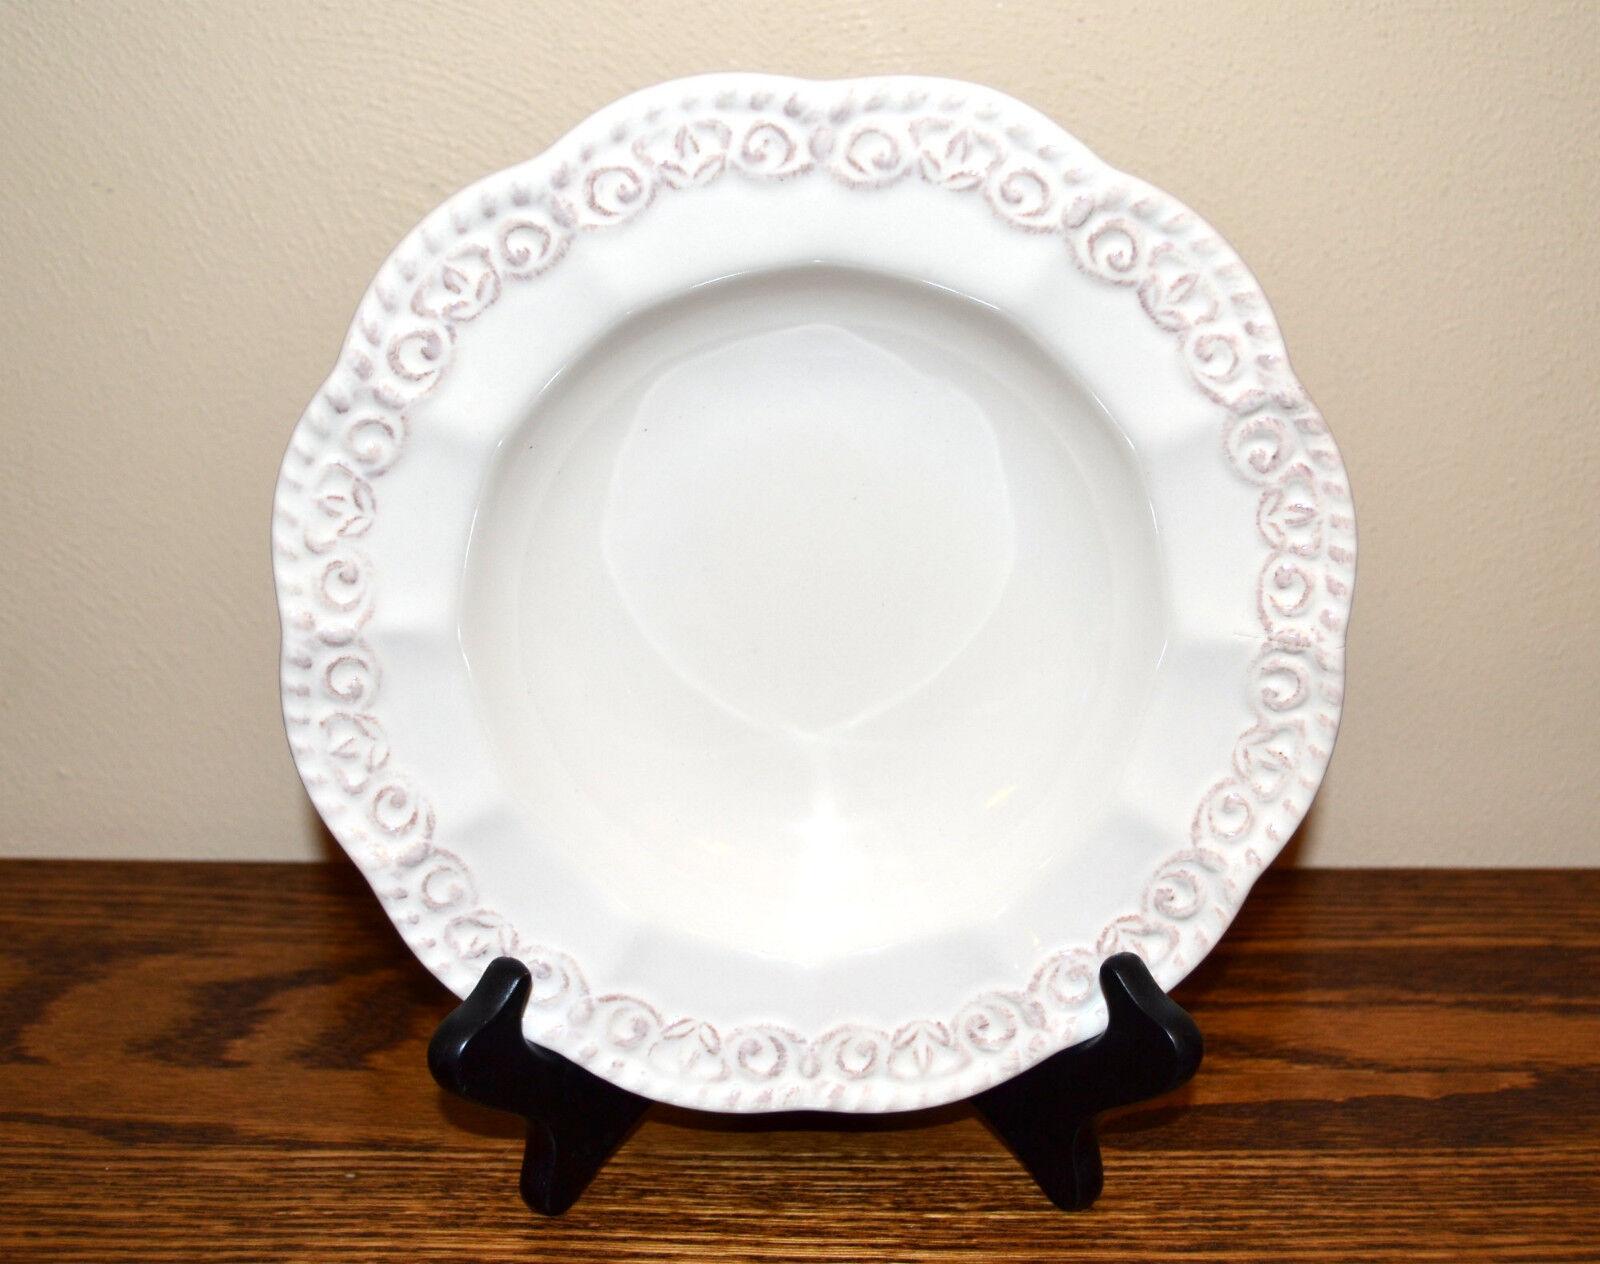 Certified International Florentine Antique White Soup Bowl  - $10.00